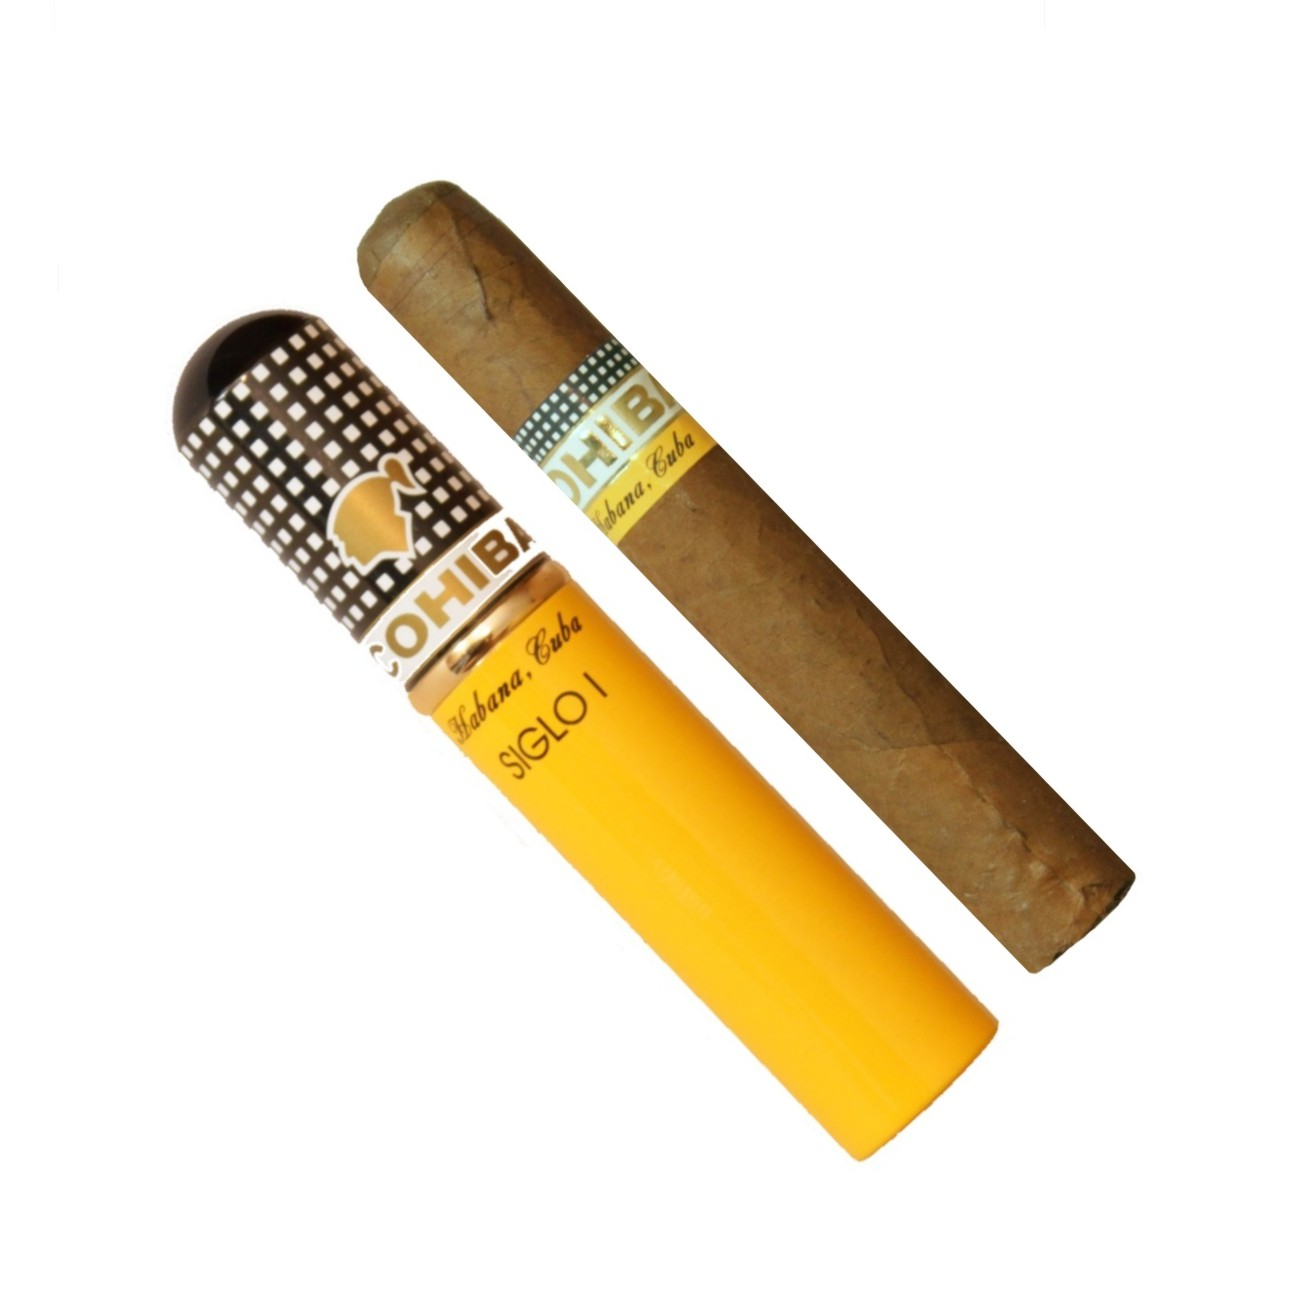 COHIBA Siglo i  Tubos Cigar,科伊巴高希霸世纪1号铝管装(筒裝)雪茄